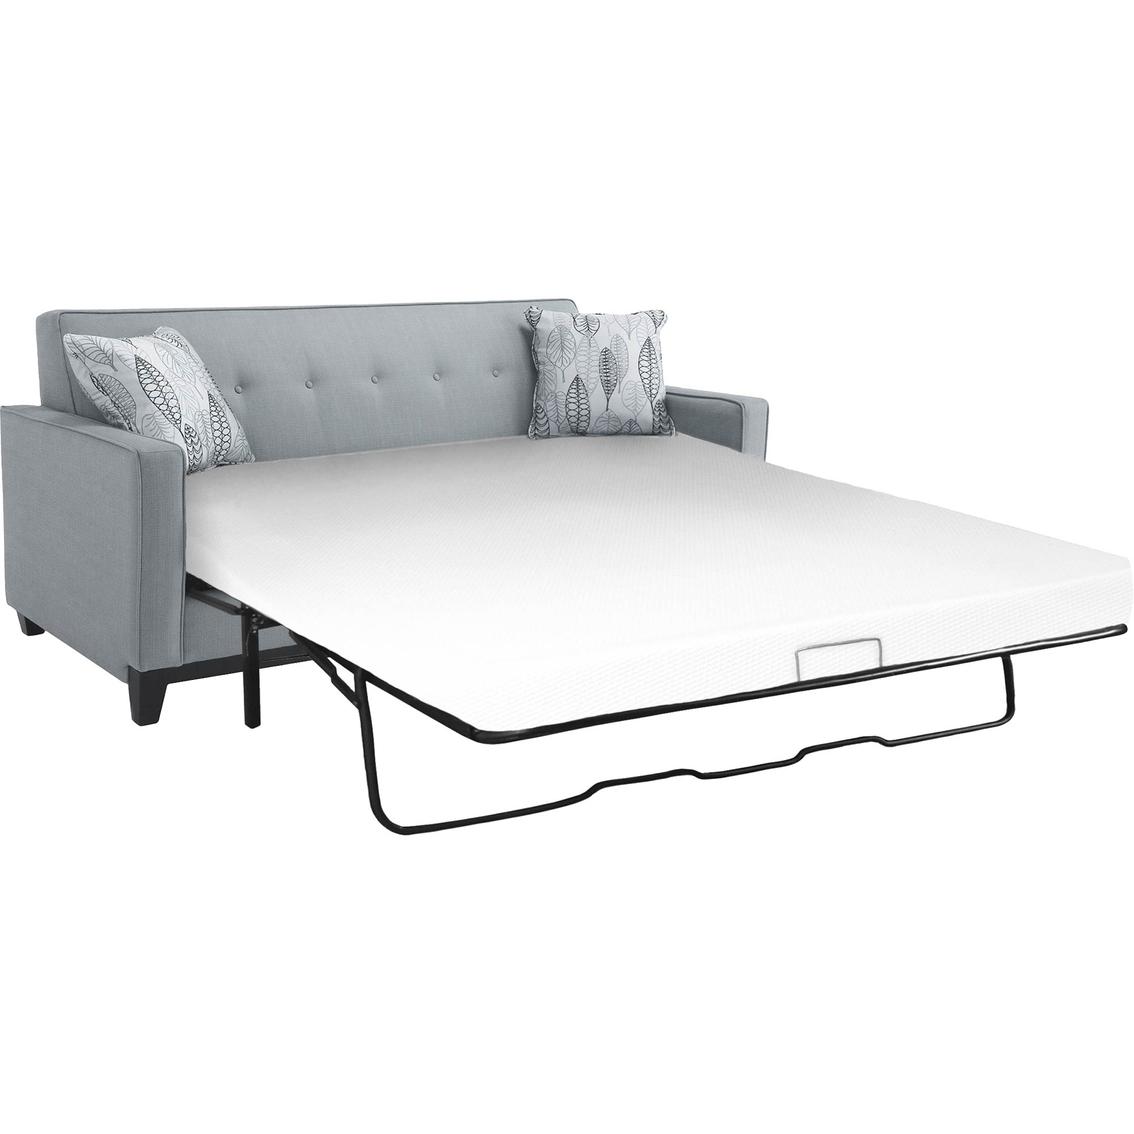 Snuggle Home Memory Foam Full Sleep Sofa Replacement Mattress Mattresses Home Appliances